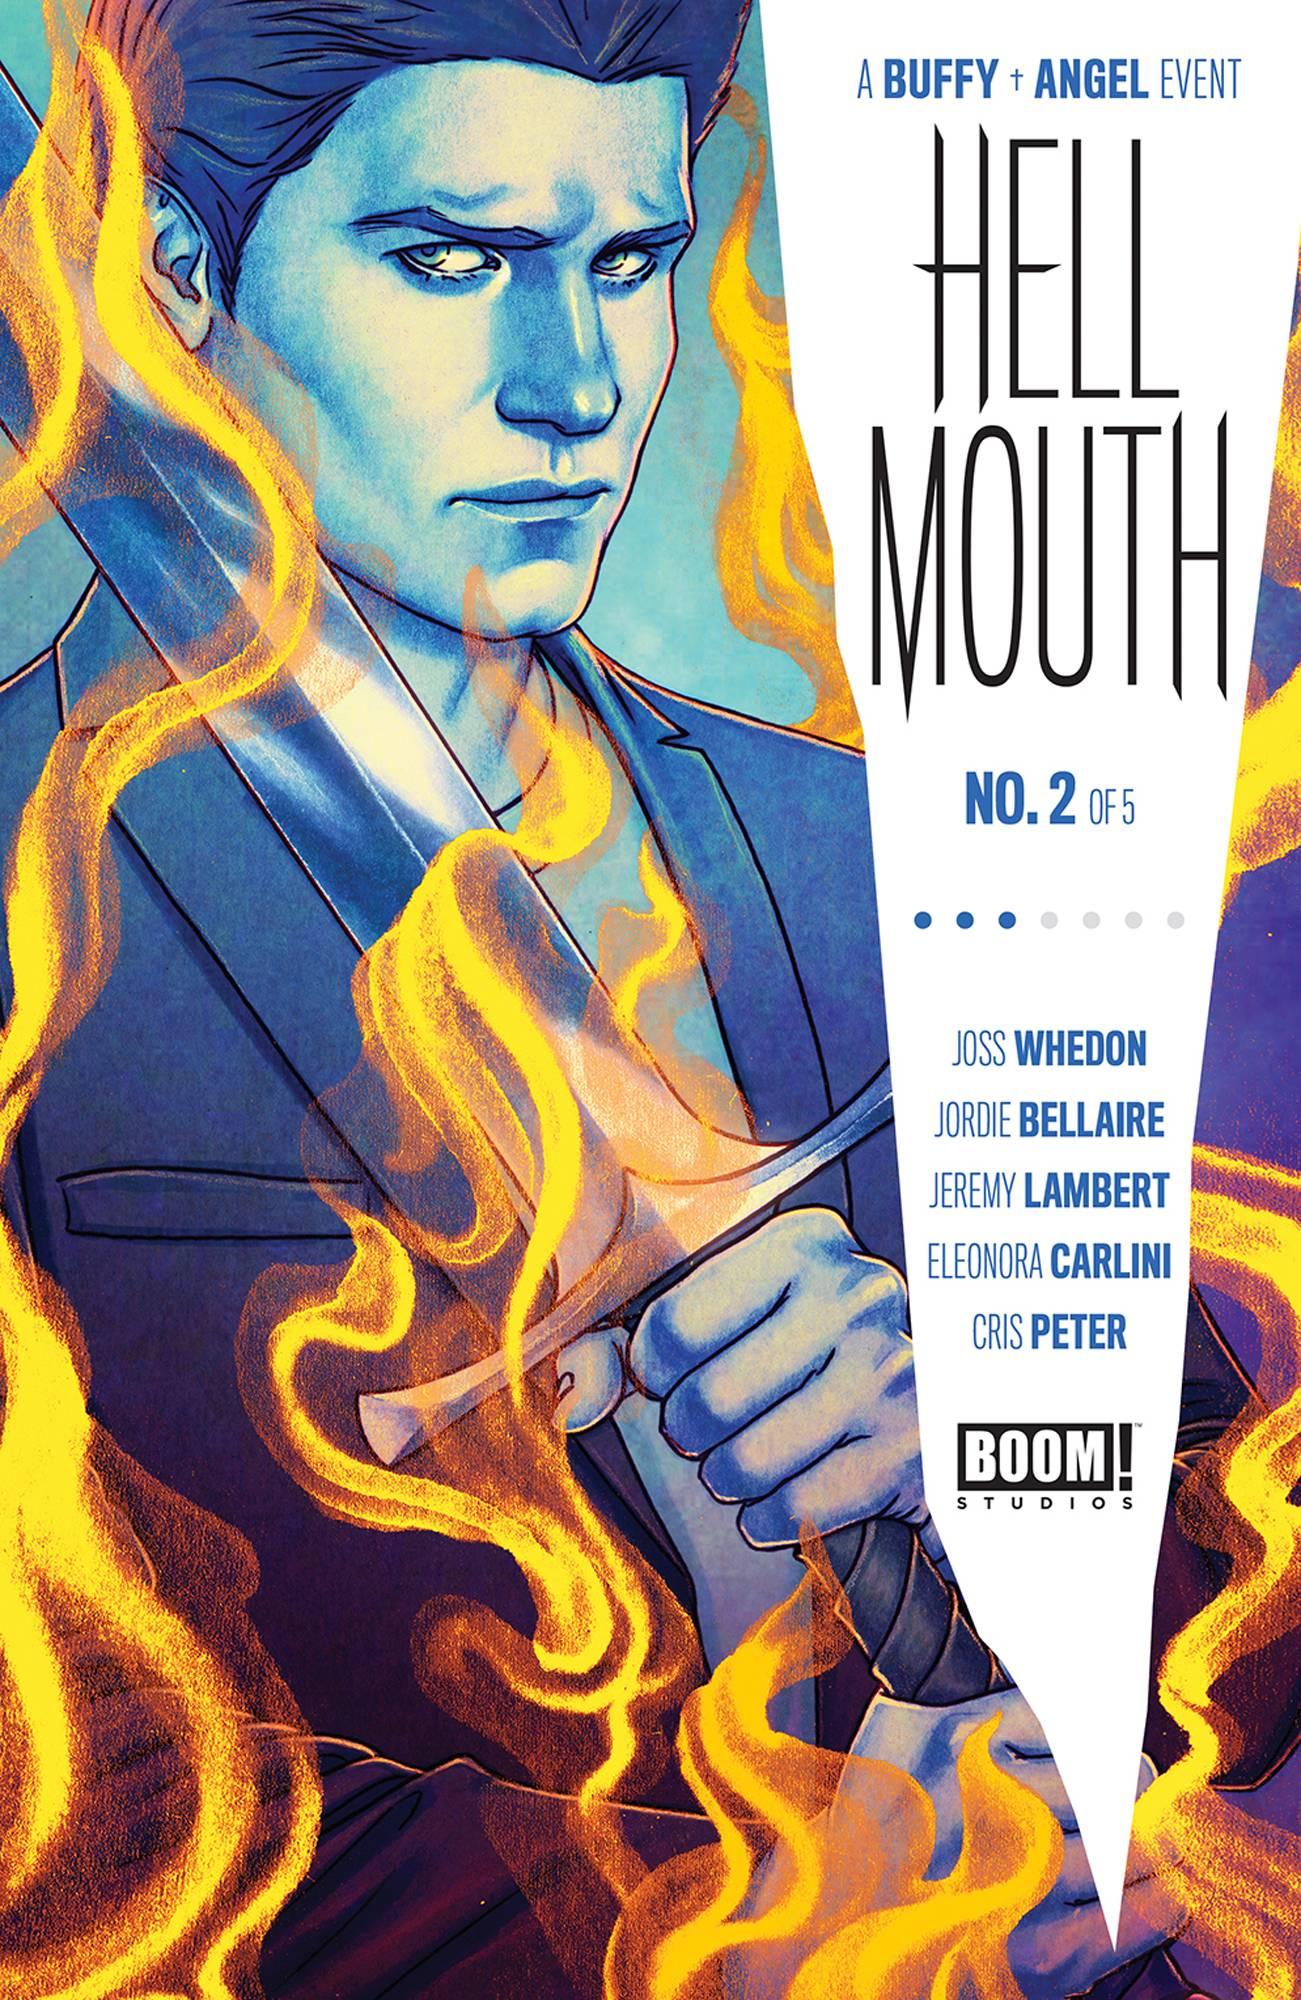 Buffy Vampire Slayer: Angel - Hellmouth #2 (2019)